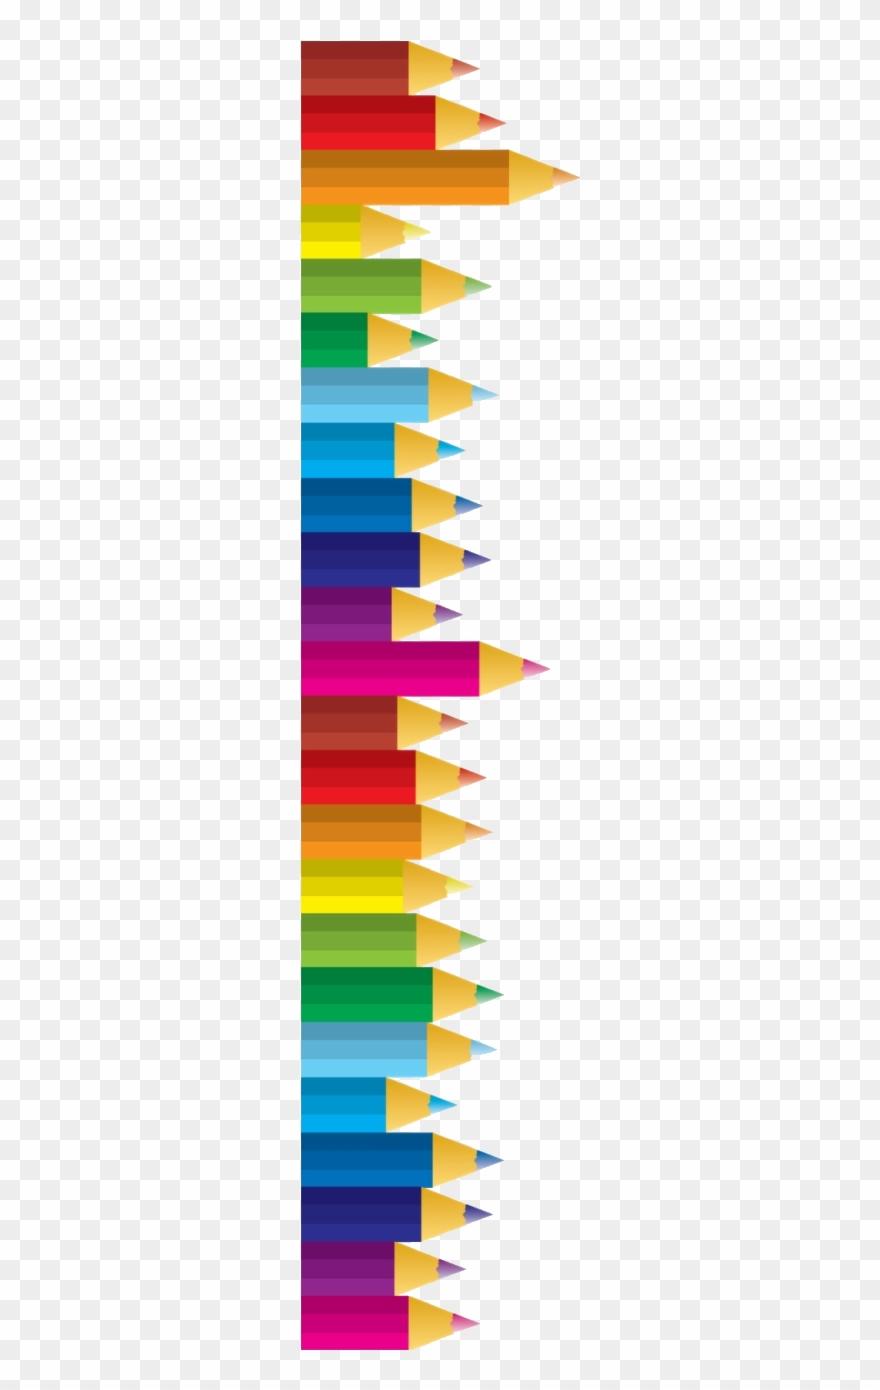 Pencil Colored Pencils Clipart Transparent Images Free - Pencil Border Clipart - Png Download